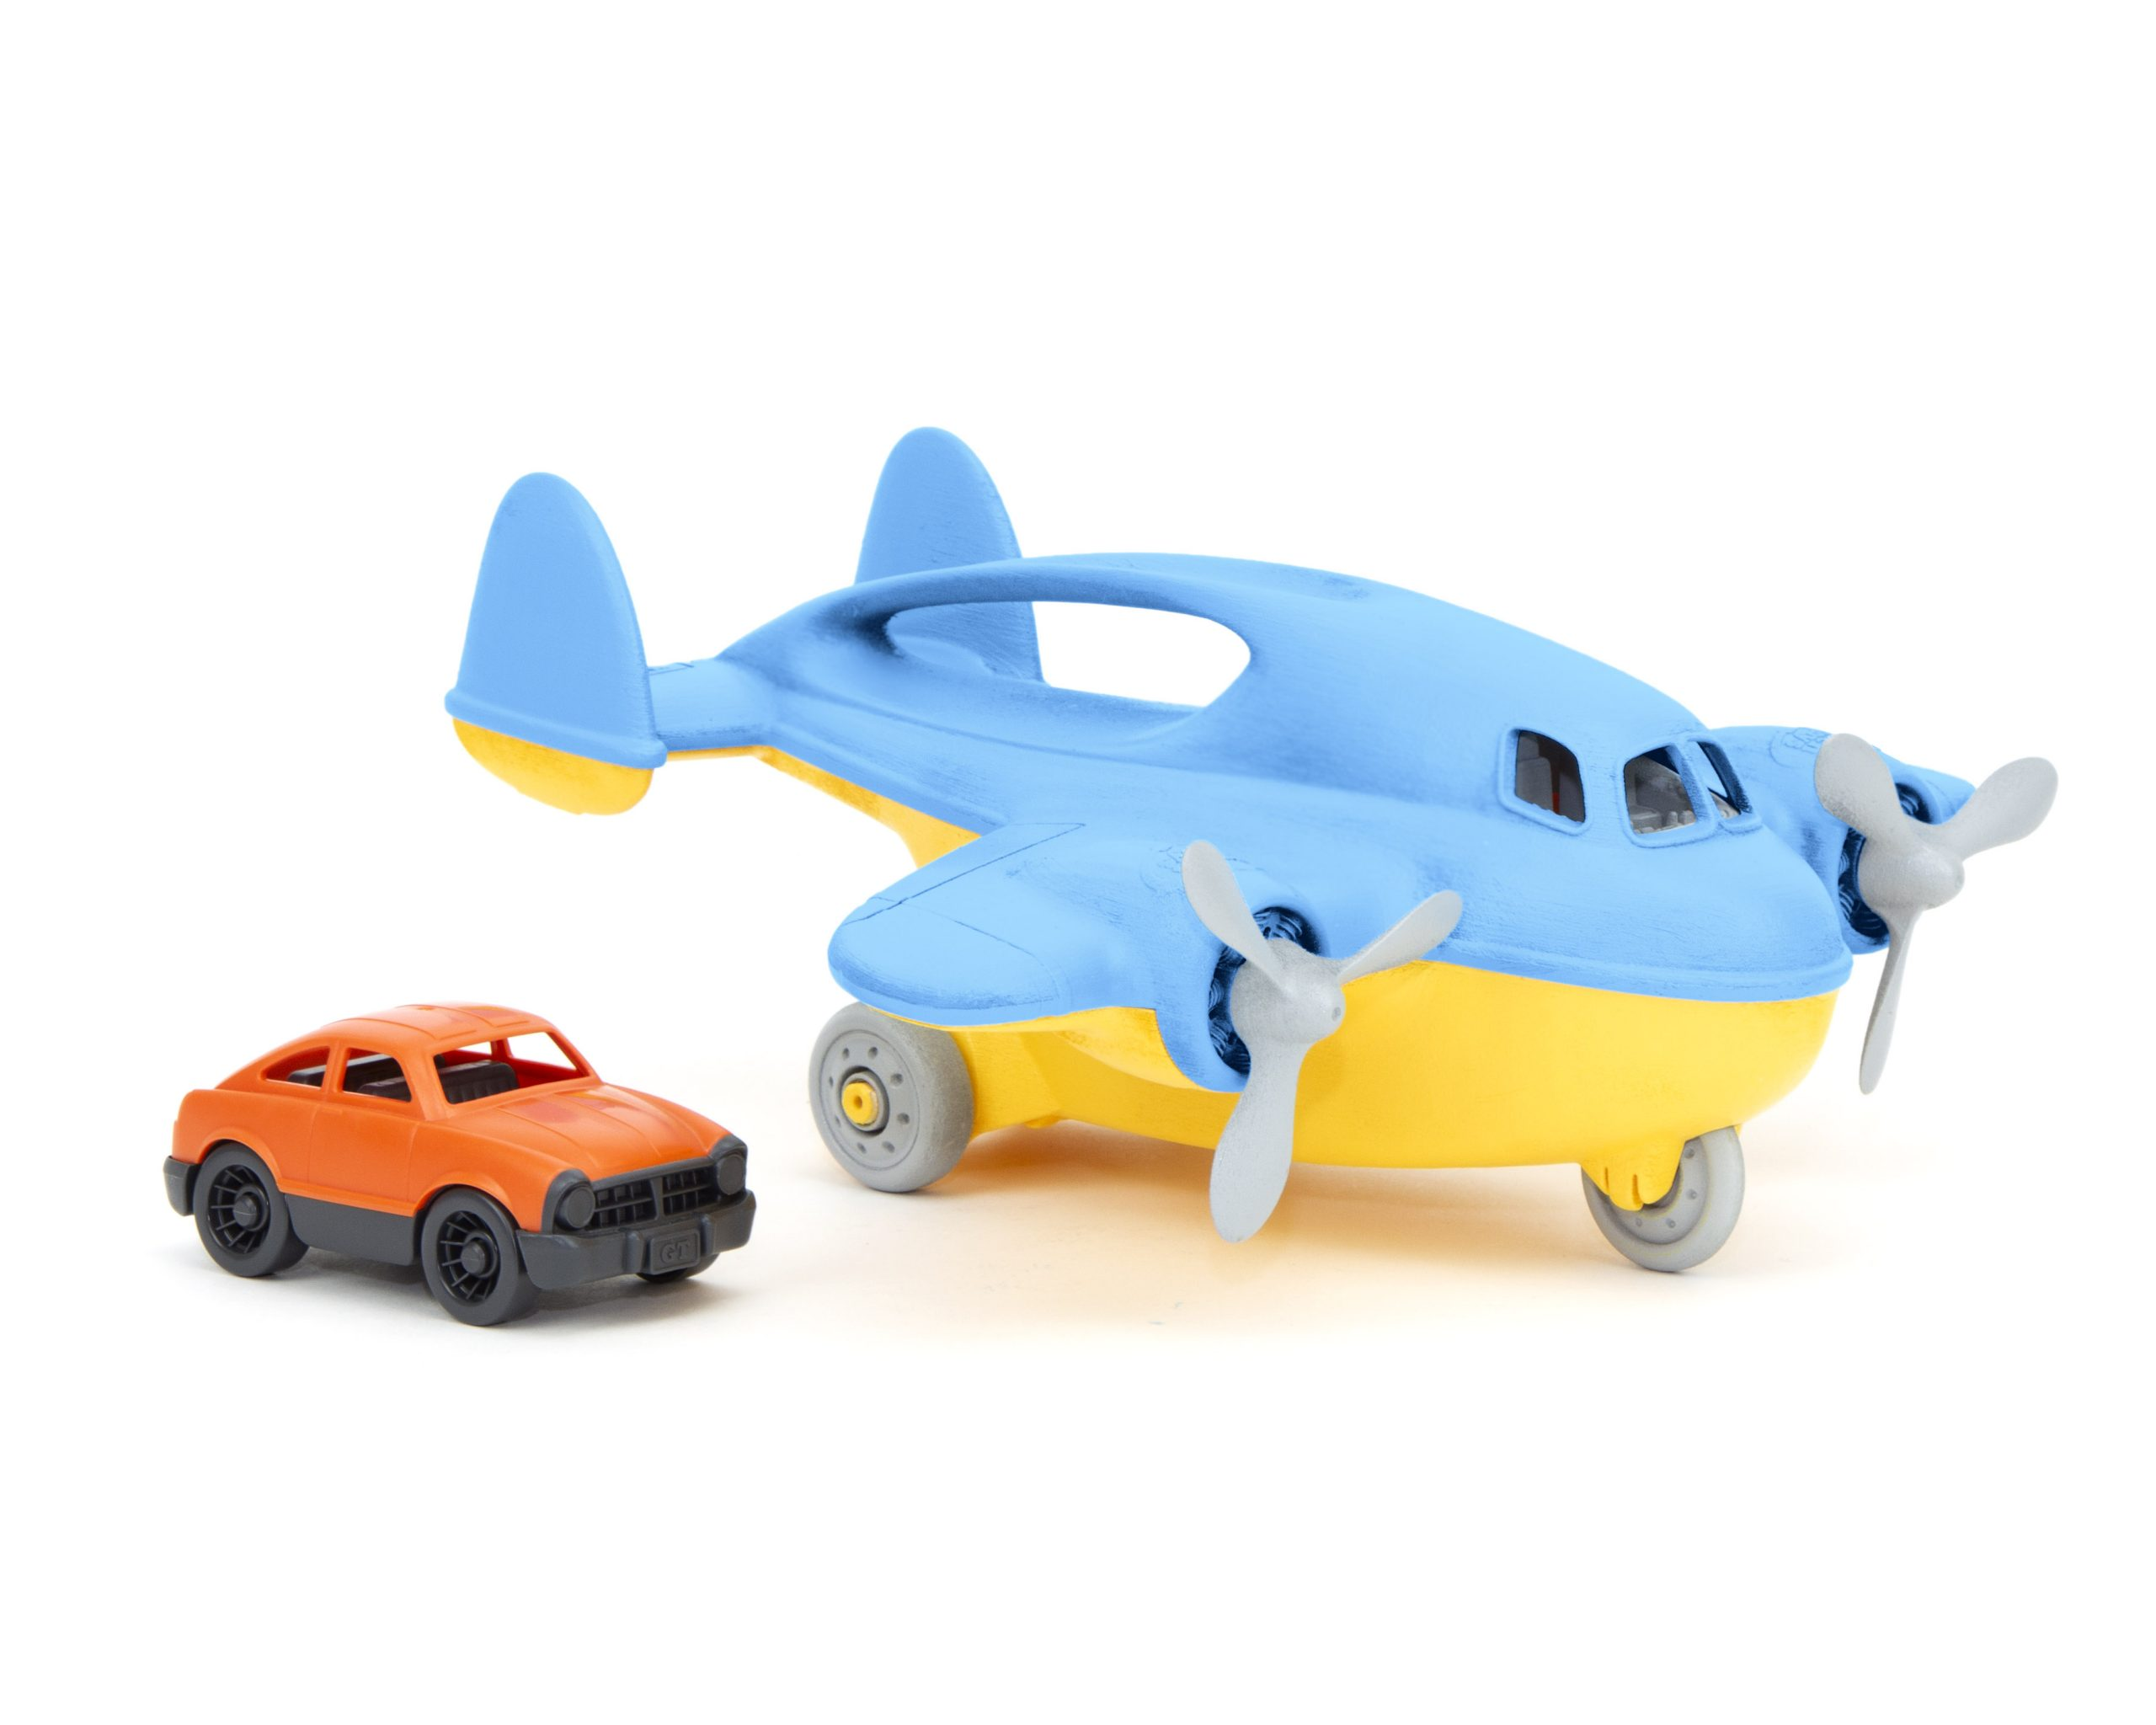 Green Toys: Αεροπλάνο για Εμπορεύματα - B3:B42 Μπλε CRGB-1399